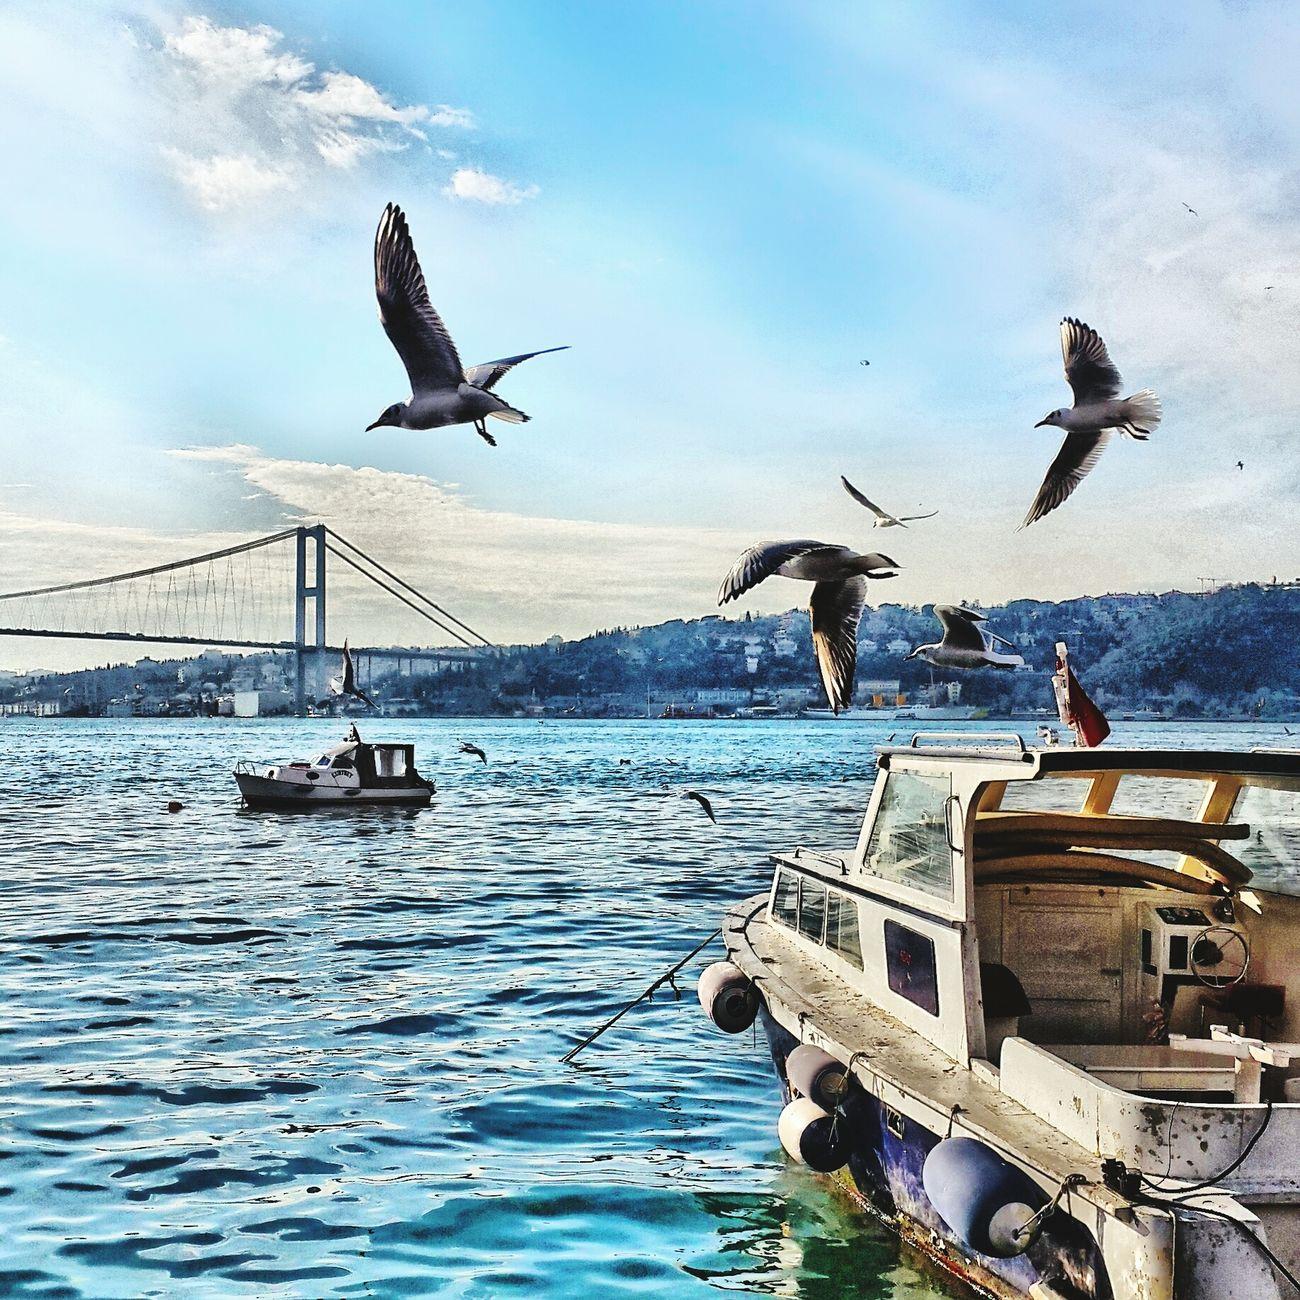 Turkishfollowers Vscodaily Instalove Hello World Instadaily Vscoonly Vscocamturkey Instamood Vscocam Vscoturkey Vscogrid Vscofilm Vscogood Instaphoto VSCO Fotografheryerde Instagood